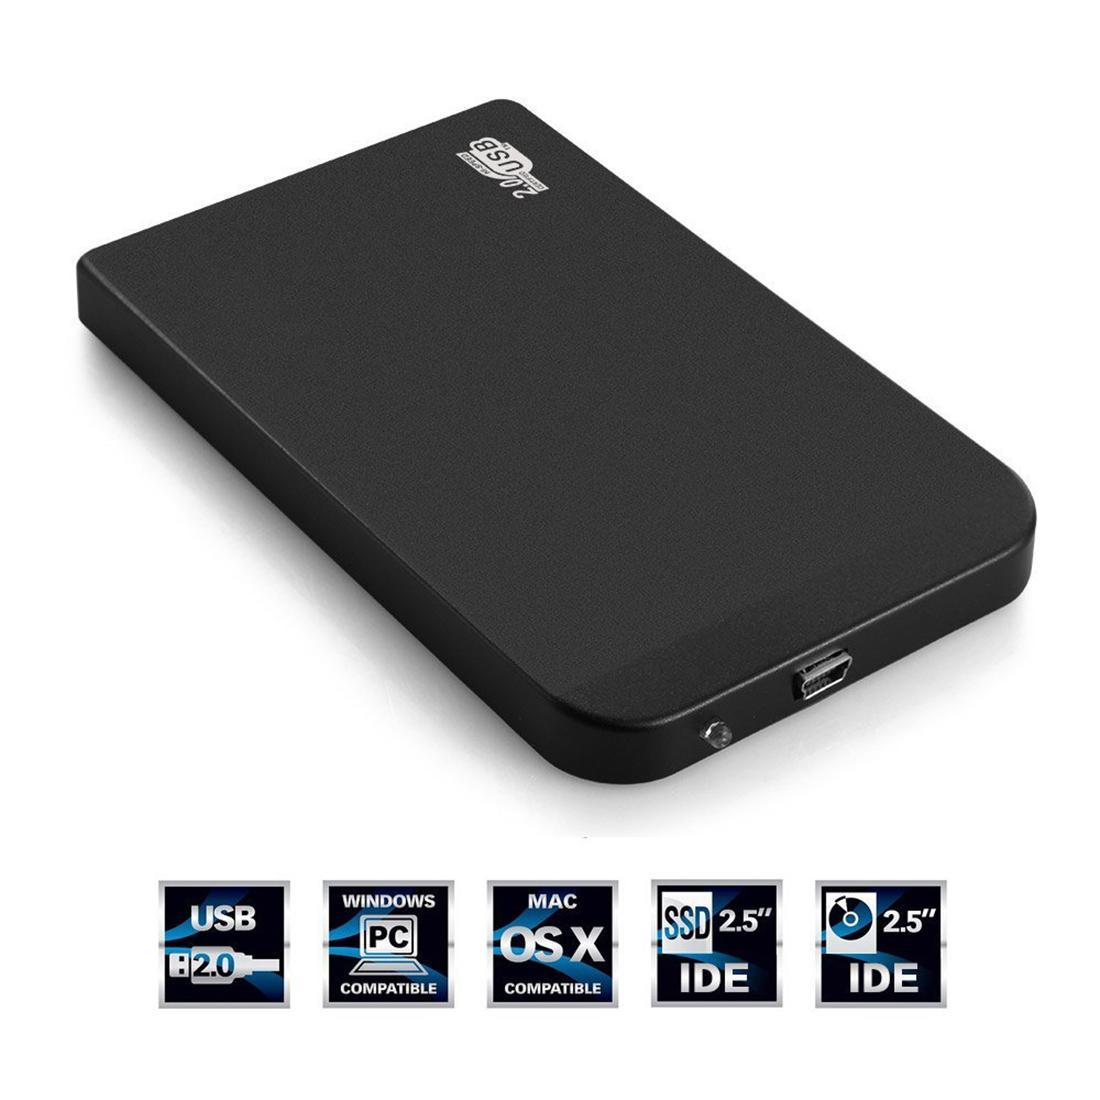 New 2.5 Inch Portable USB 2.0 IDE HDD Hard Disk Drive Enclosure External Cover Box Black(China (Mainland))